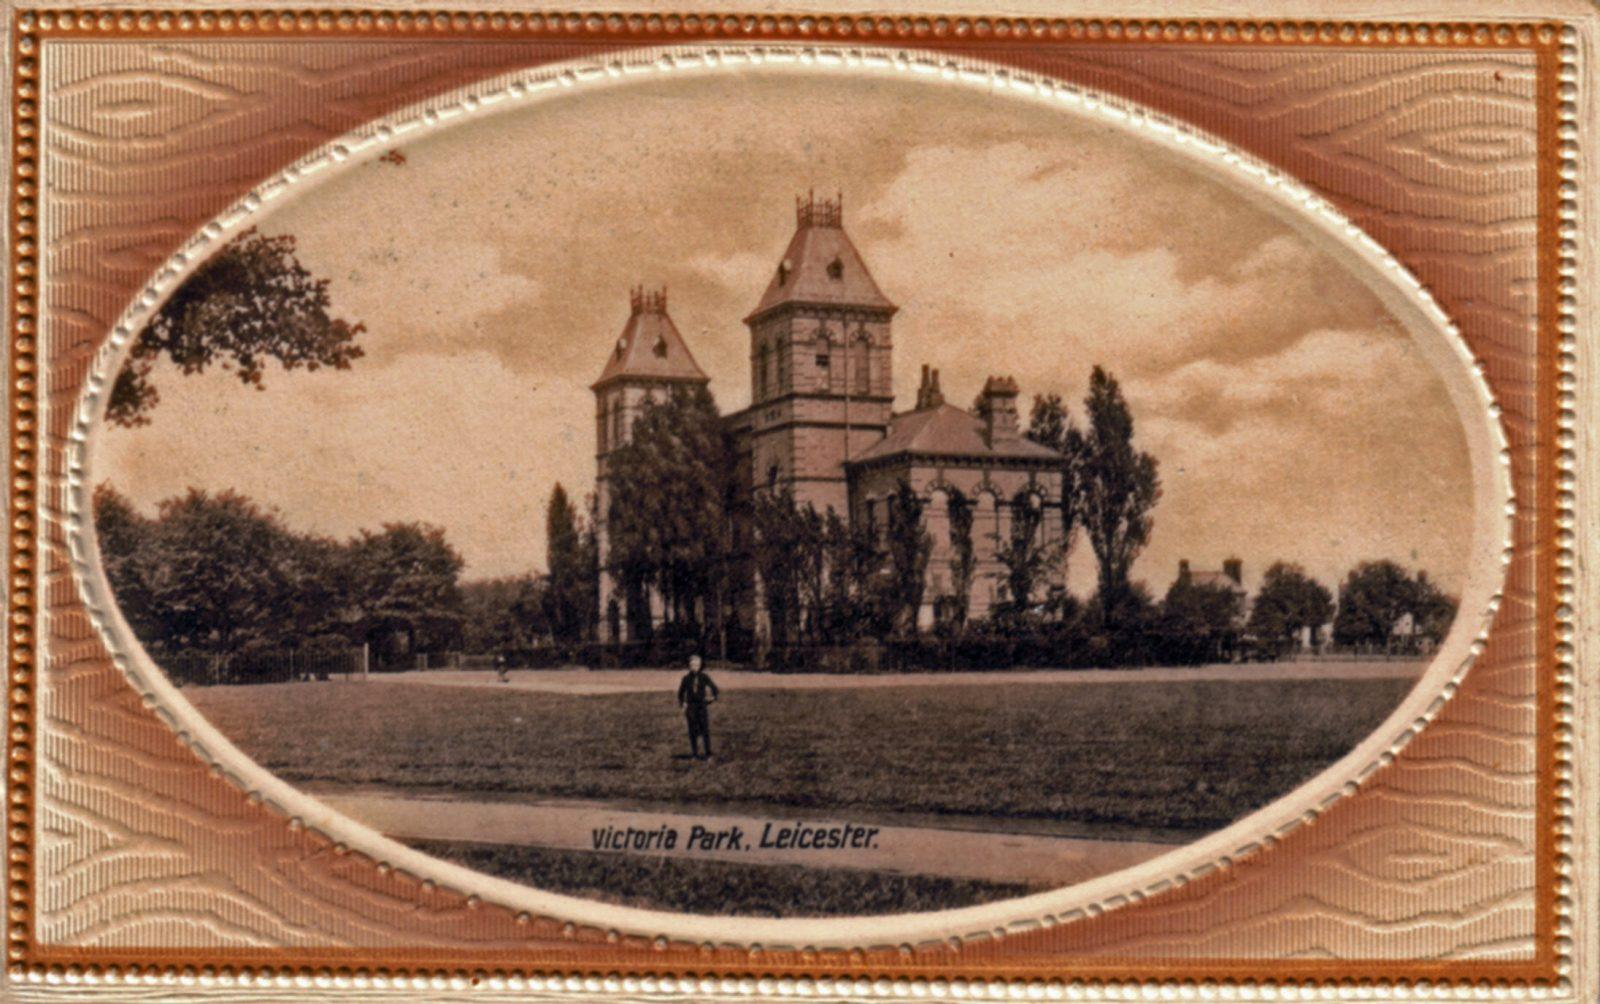 Victoria Park, Leicester. 1901-1920: Pavilion, framed. Boy in foreground. (File:1075)